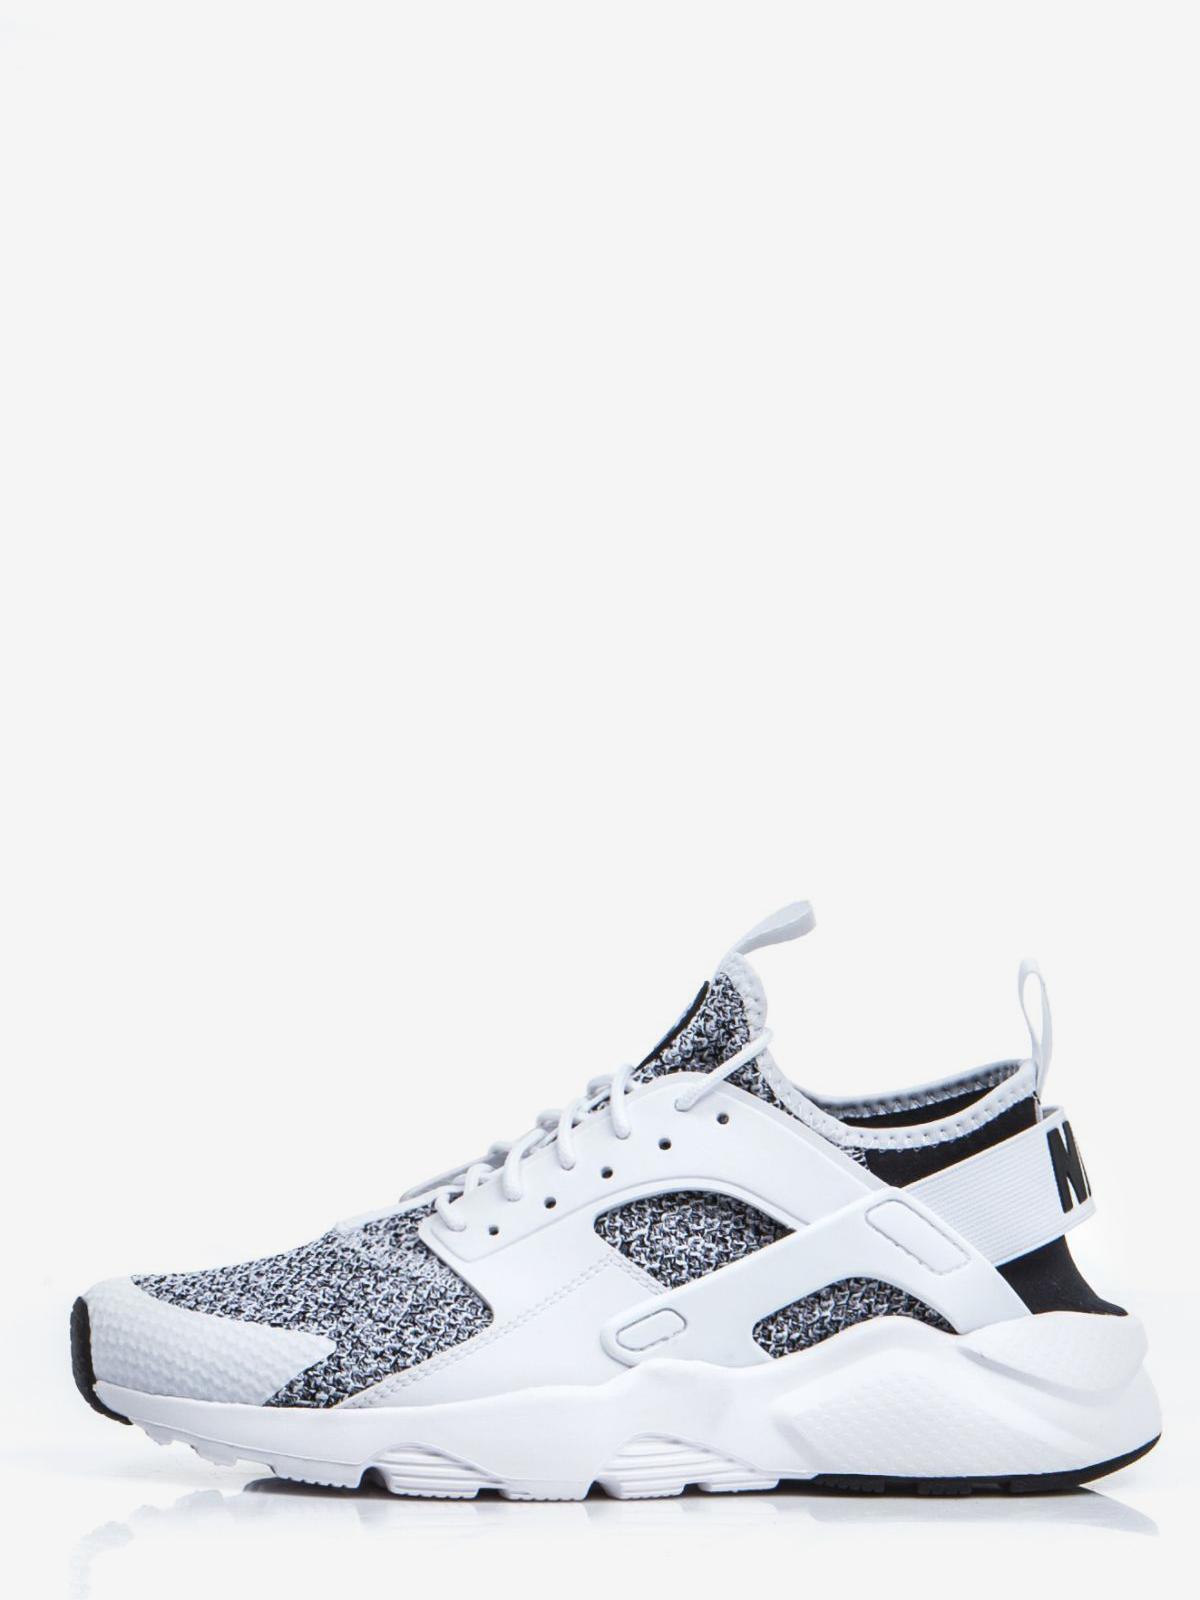 hot sale online fa679 54f85 Nike air huarache run ultra se, vyriški laisvalaikio batai ...